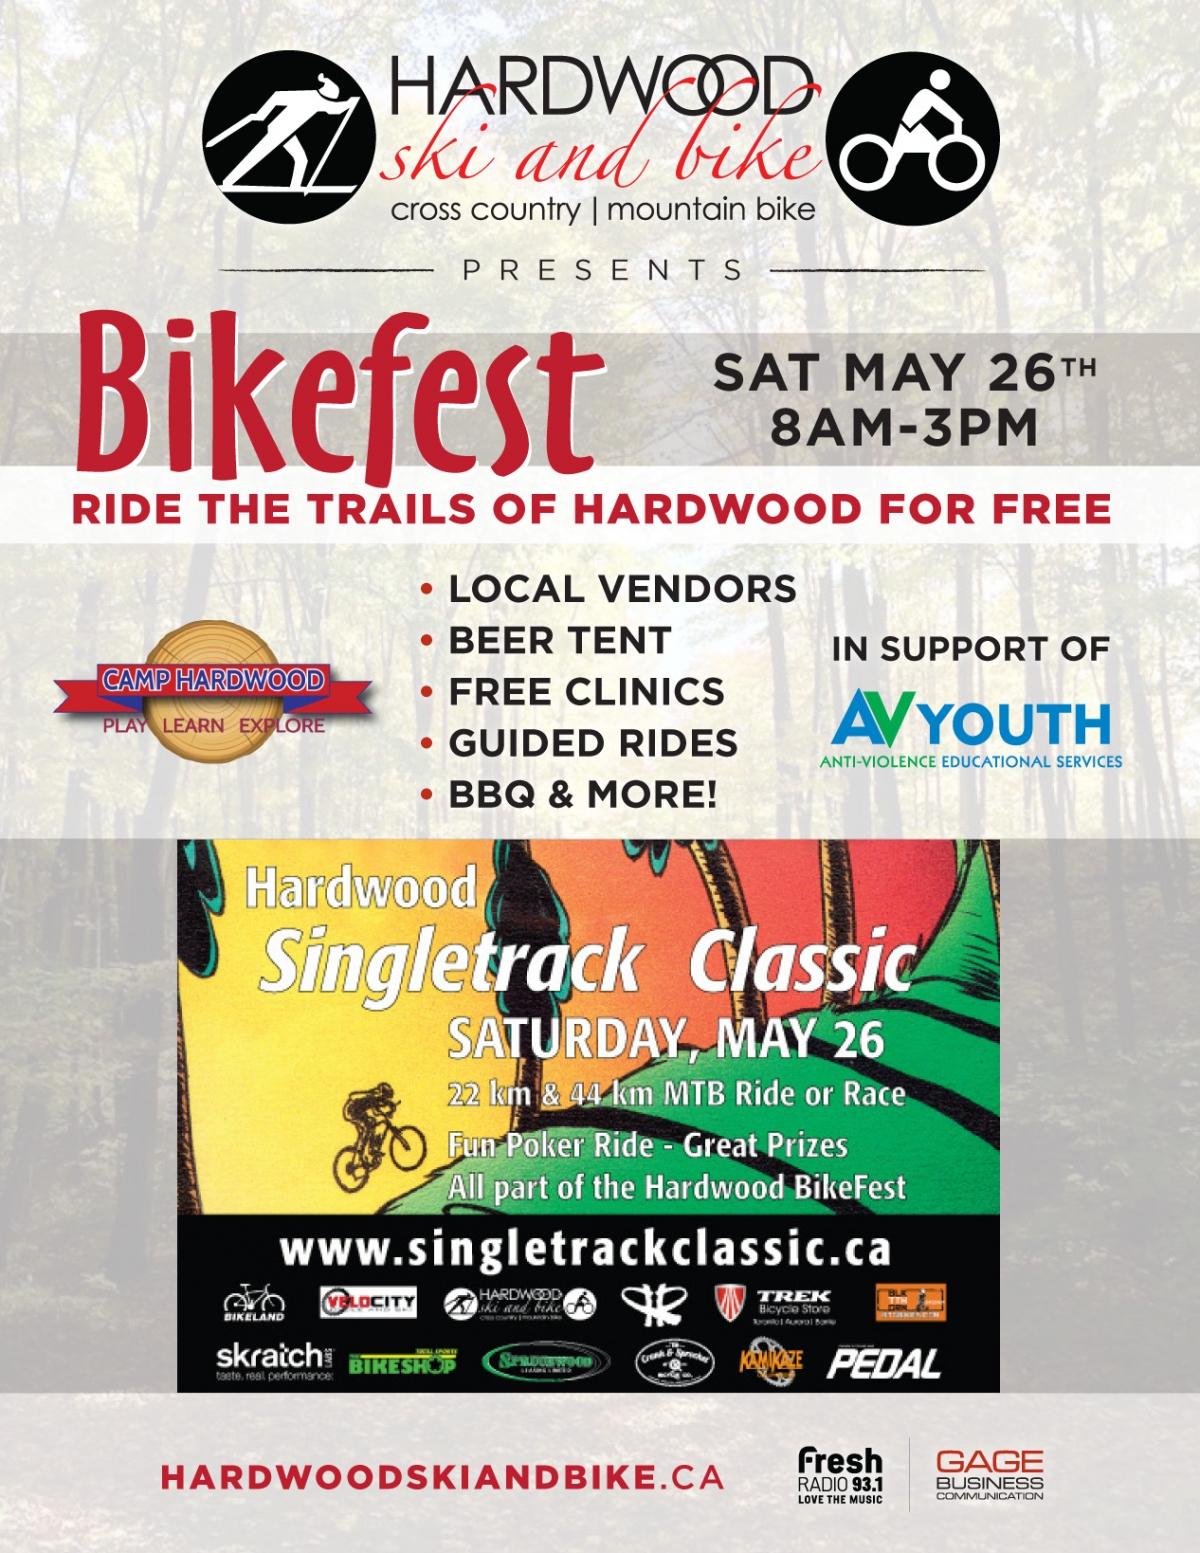 Hardwood Bikefest